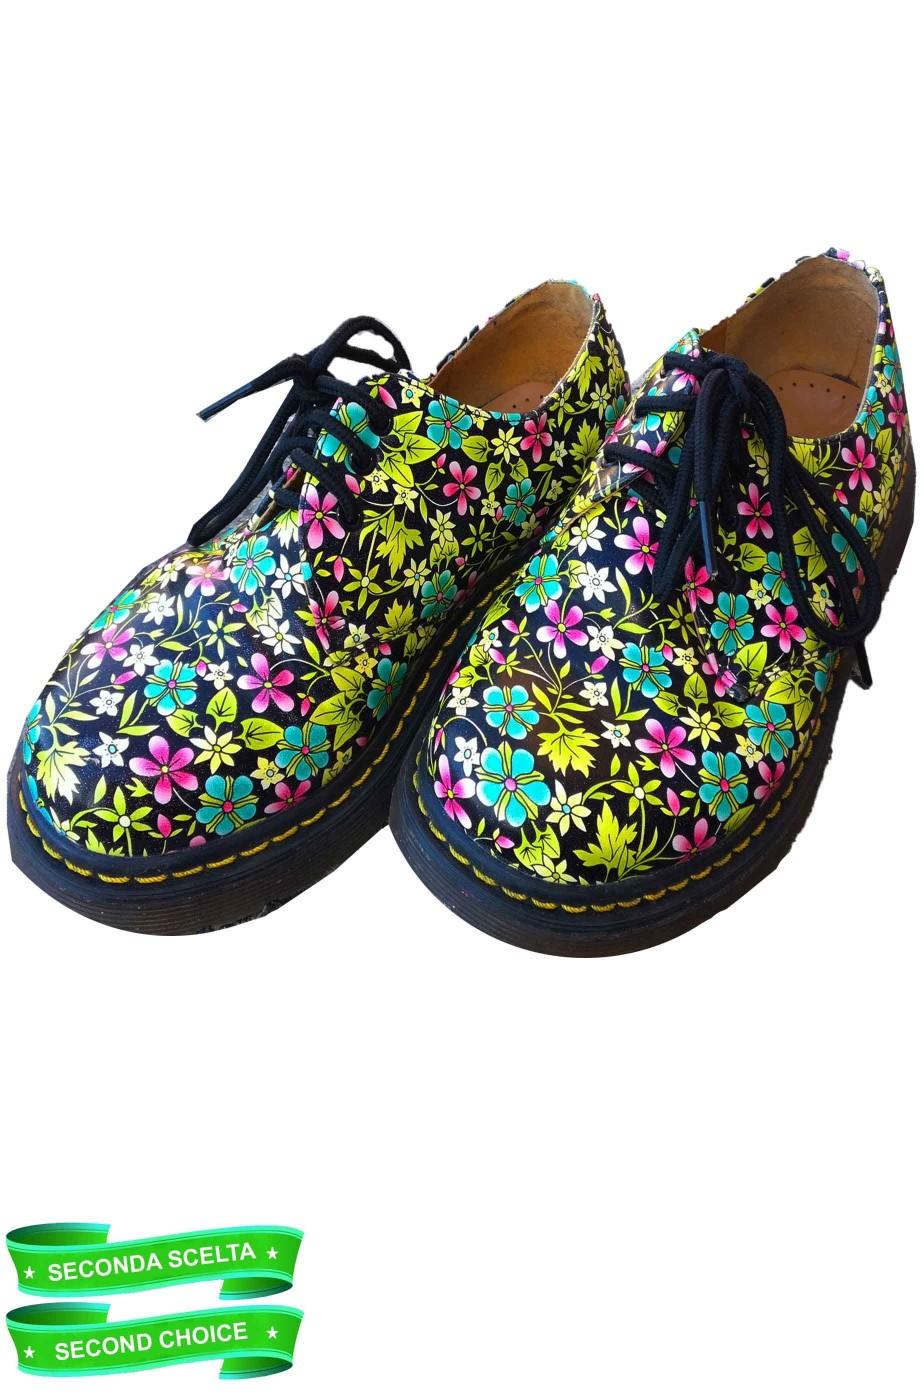 Scarpe basse anni 70 flower power 38 scarpa di test di negozio